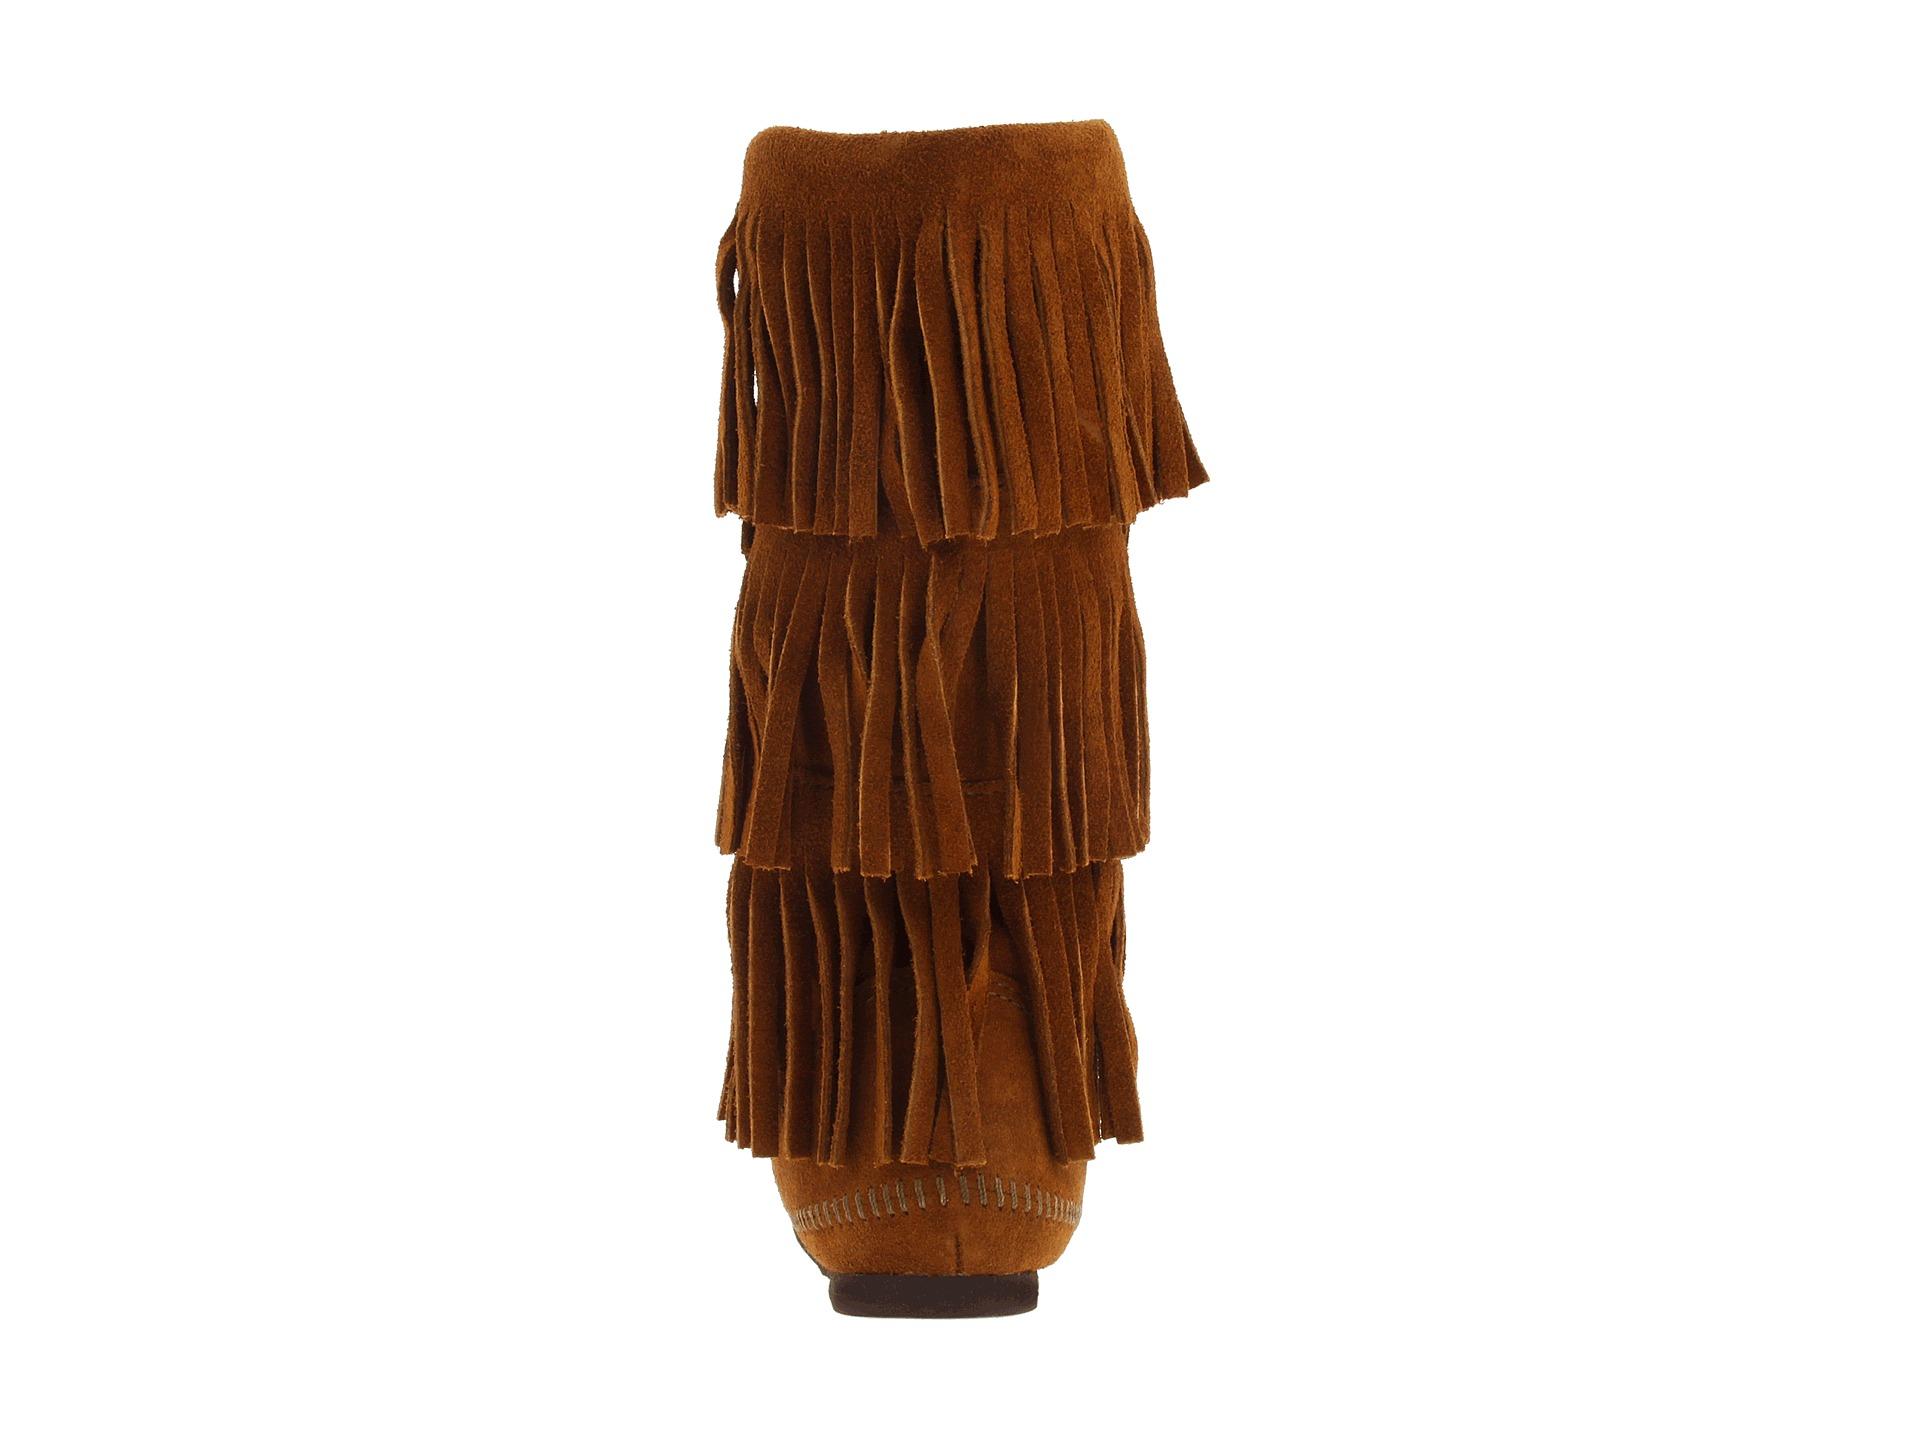 Minnetonka Calf Hi 3-Layer Fringe Taupe Suede Boots